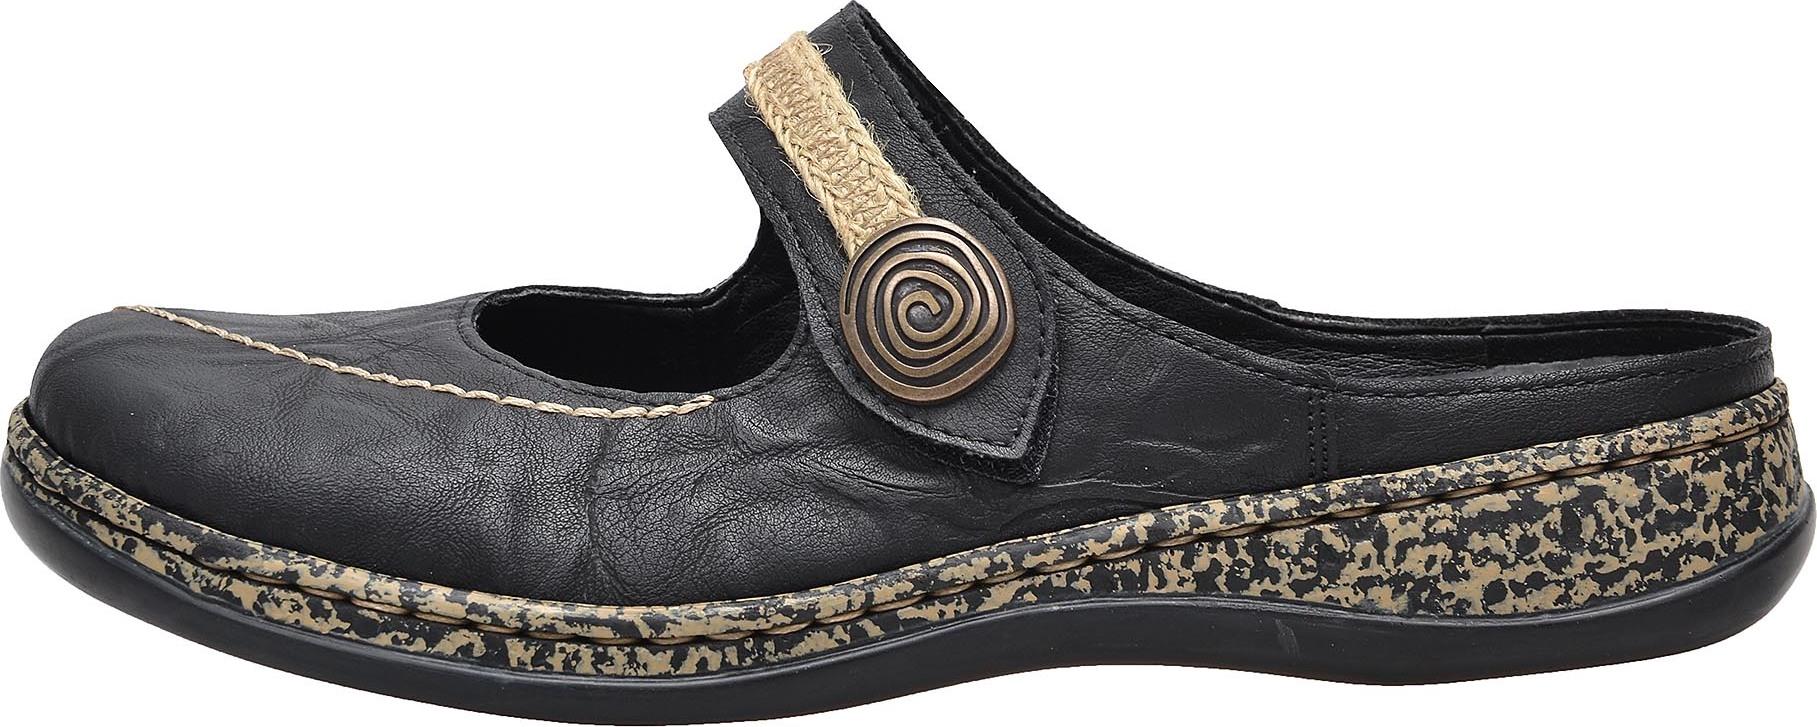 b749a82a4200 Dámská obuv RIEKER 46391 00 SCHWARZ F S 8 – Rieker Antistress